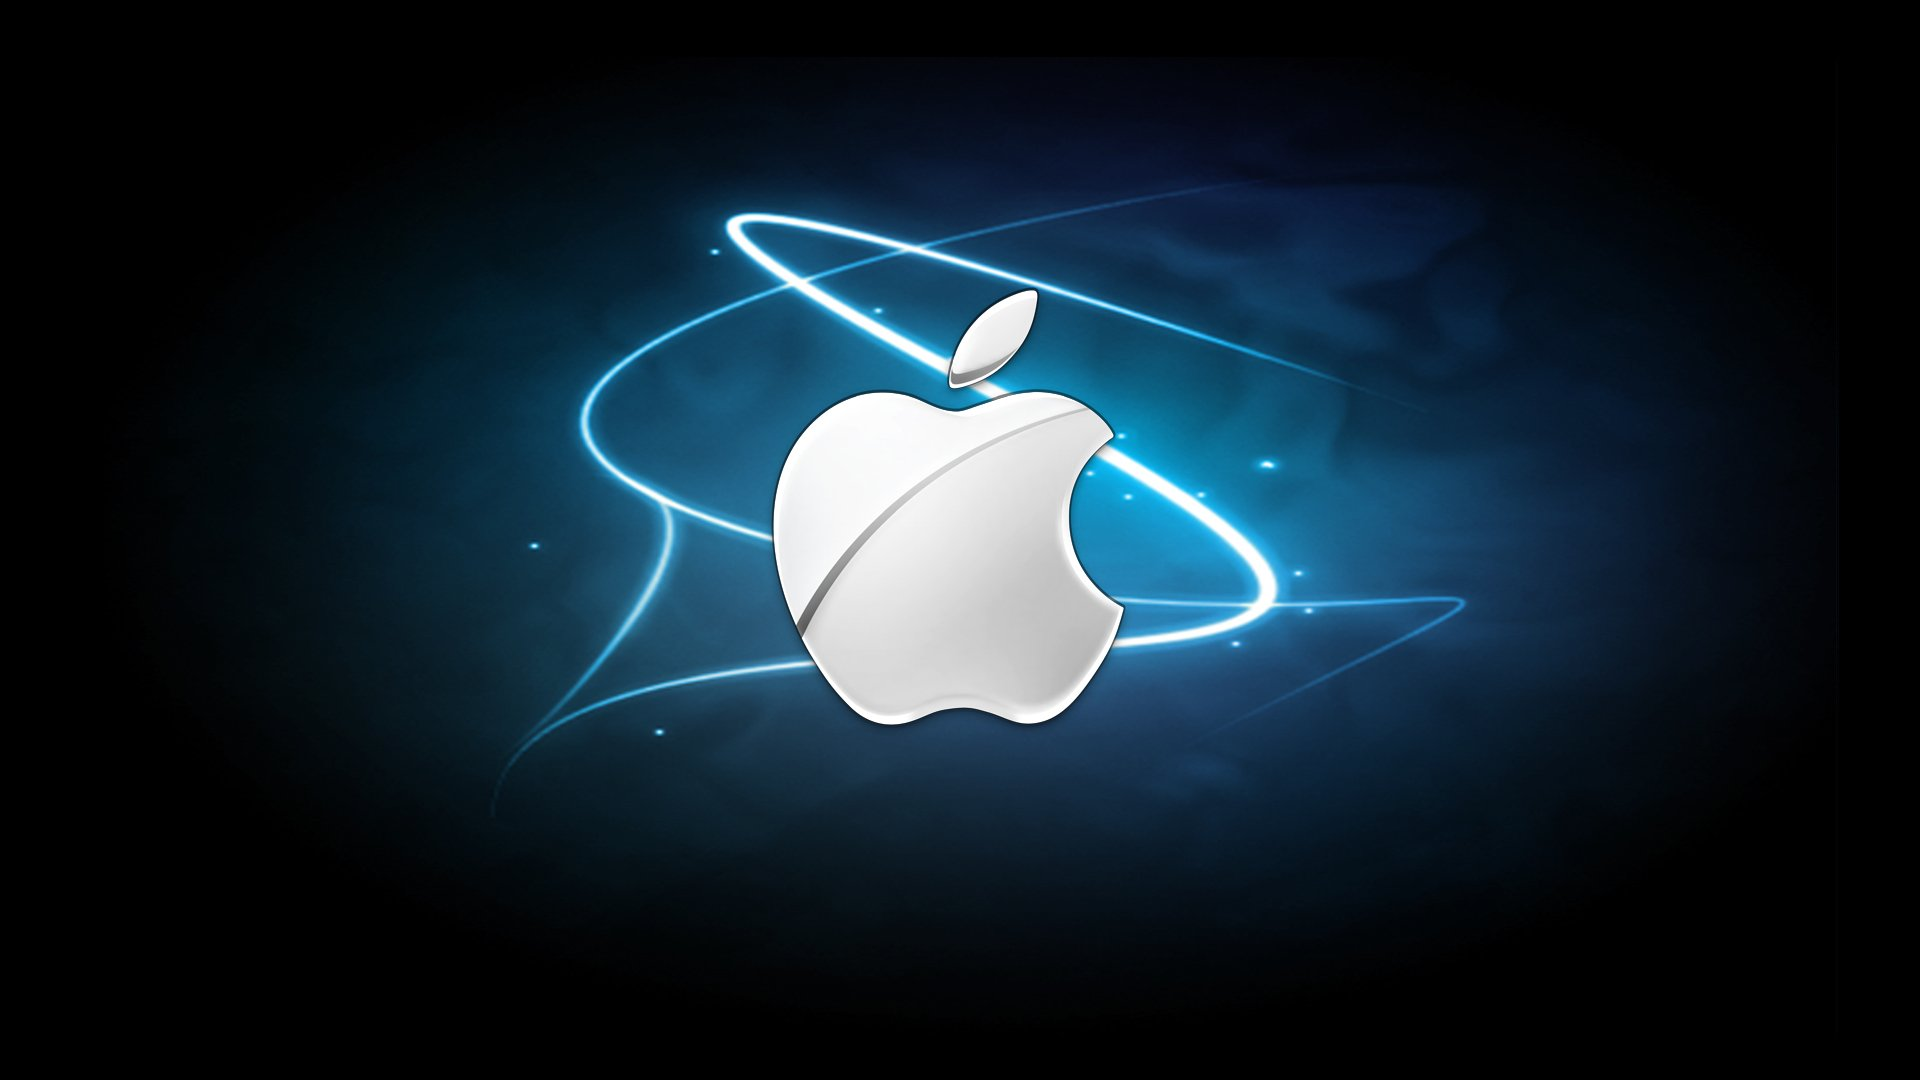 apple-logo-wallpapers